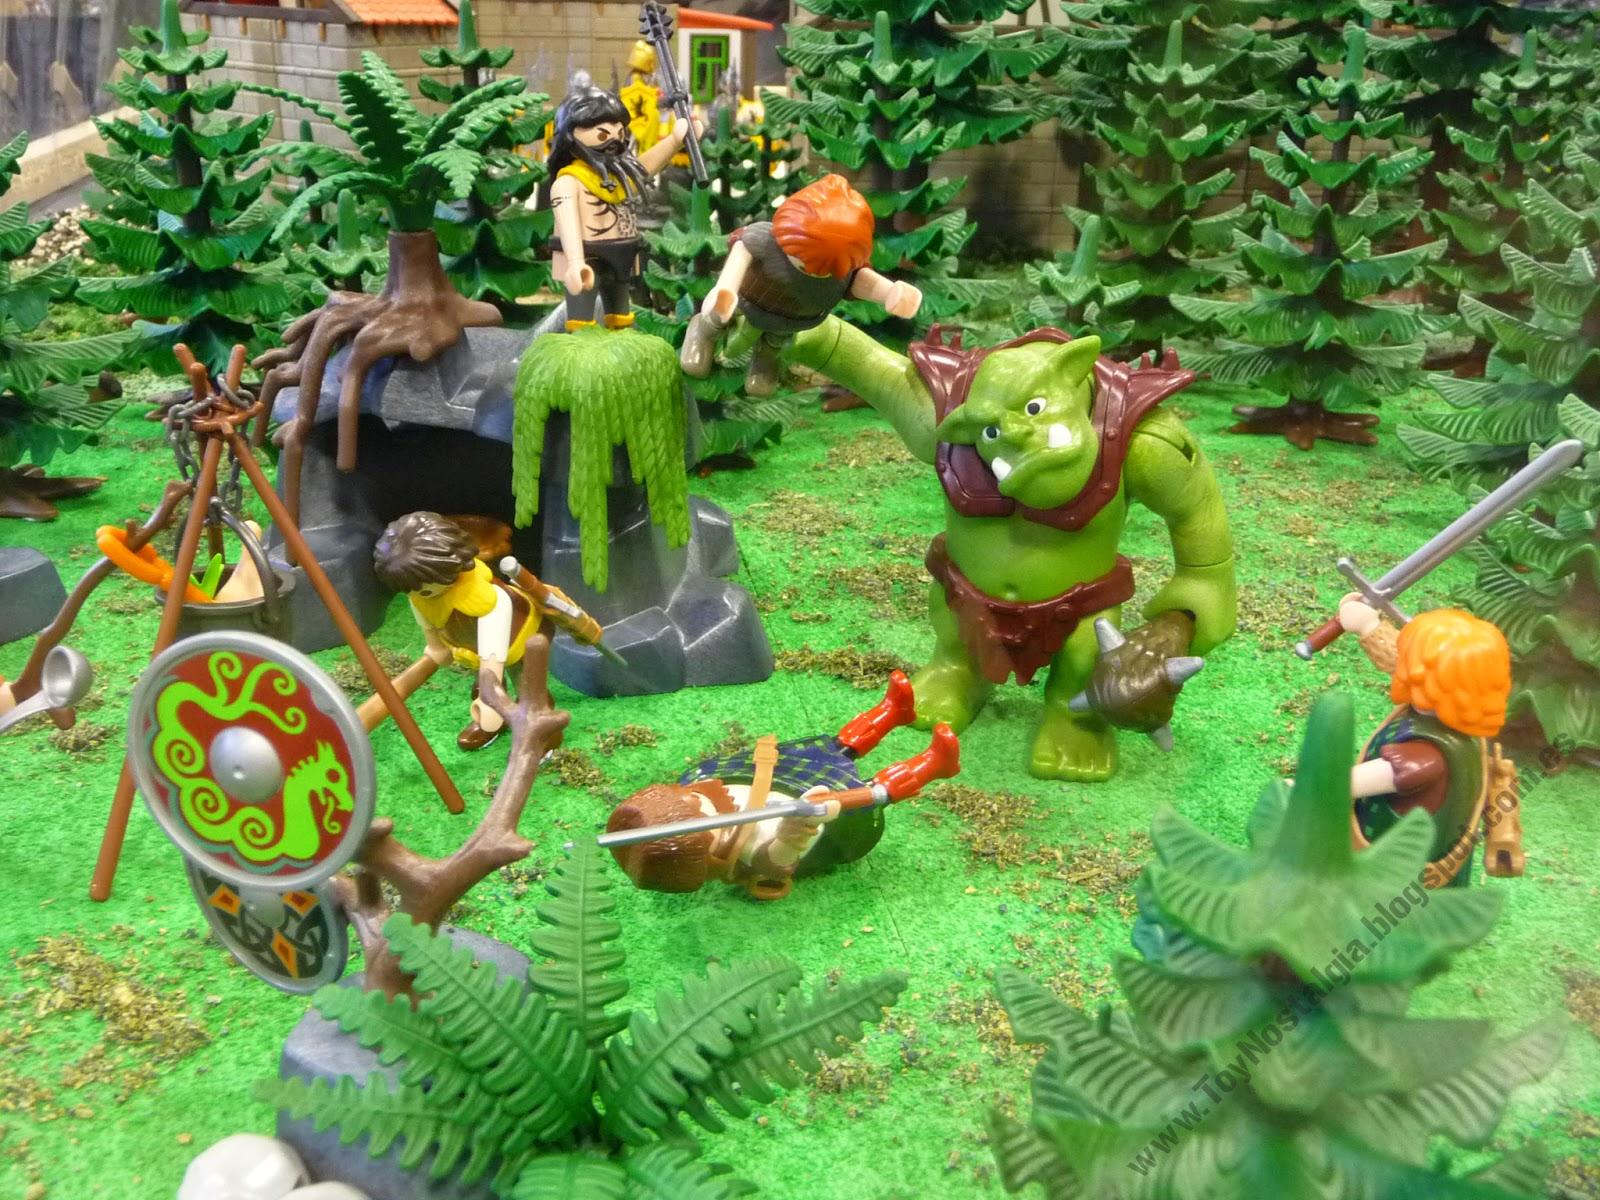 Diorama Playmobil Fantasia Fantasie Ogros